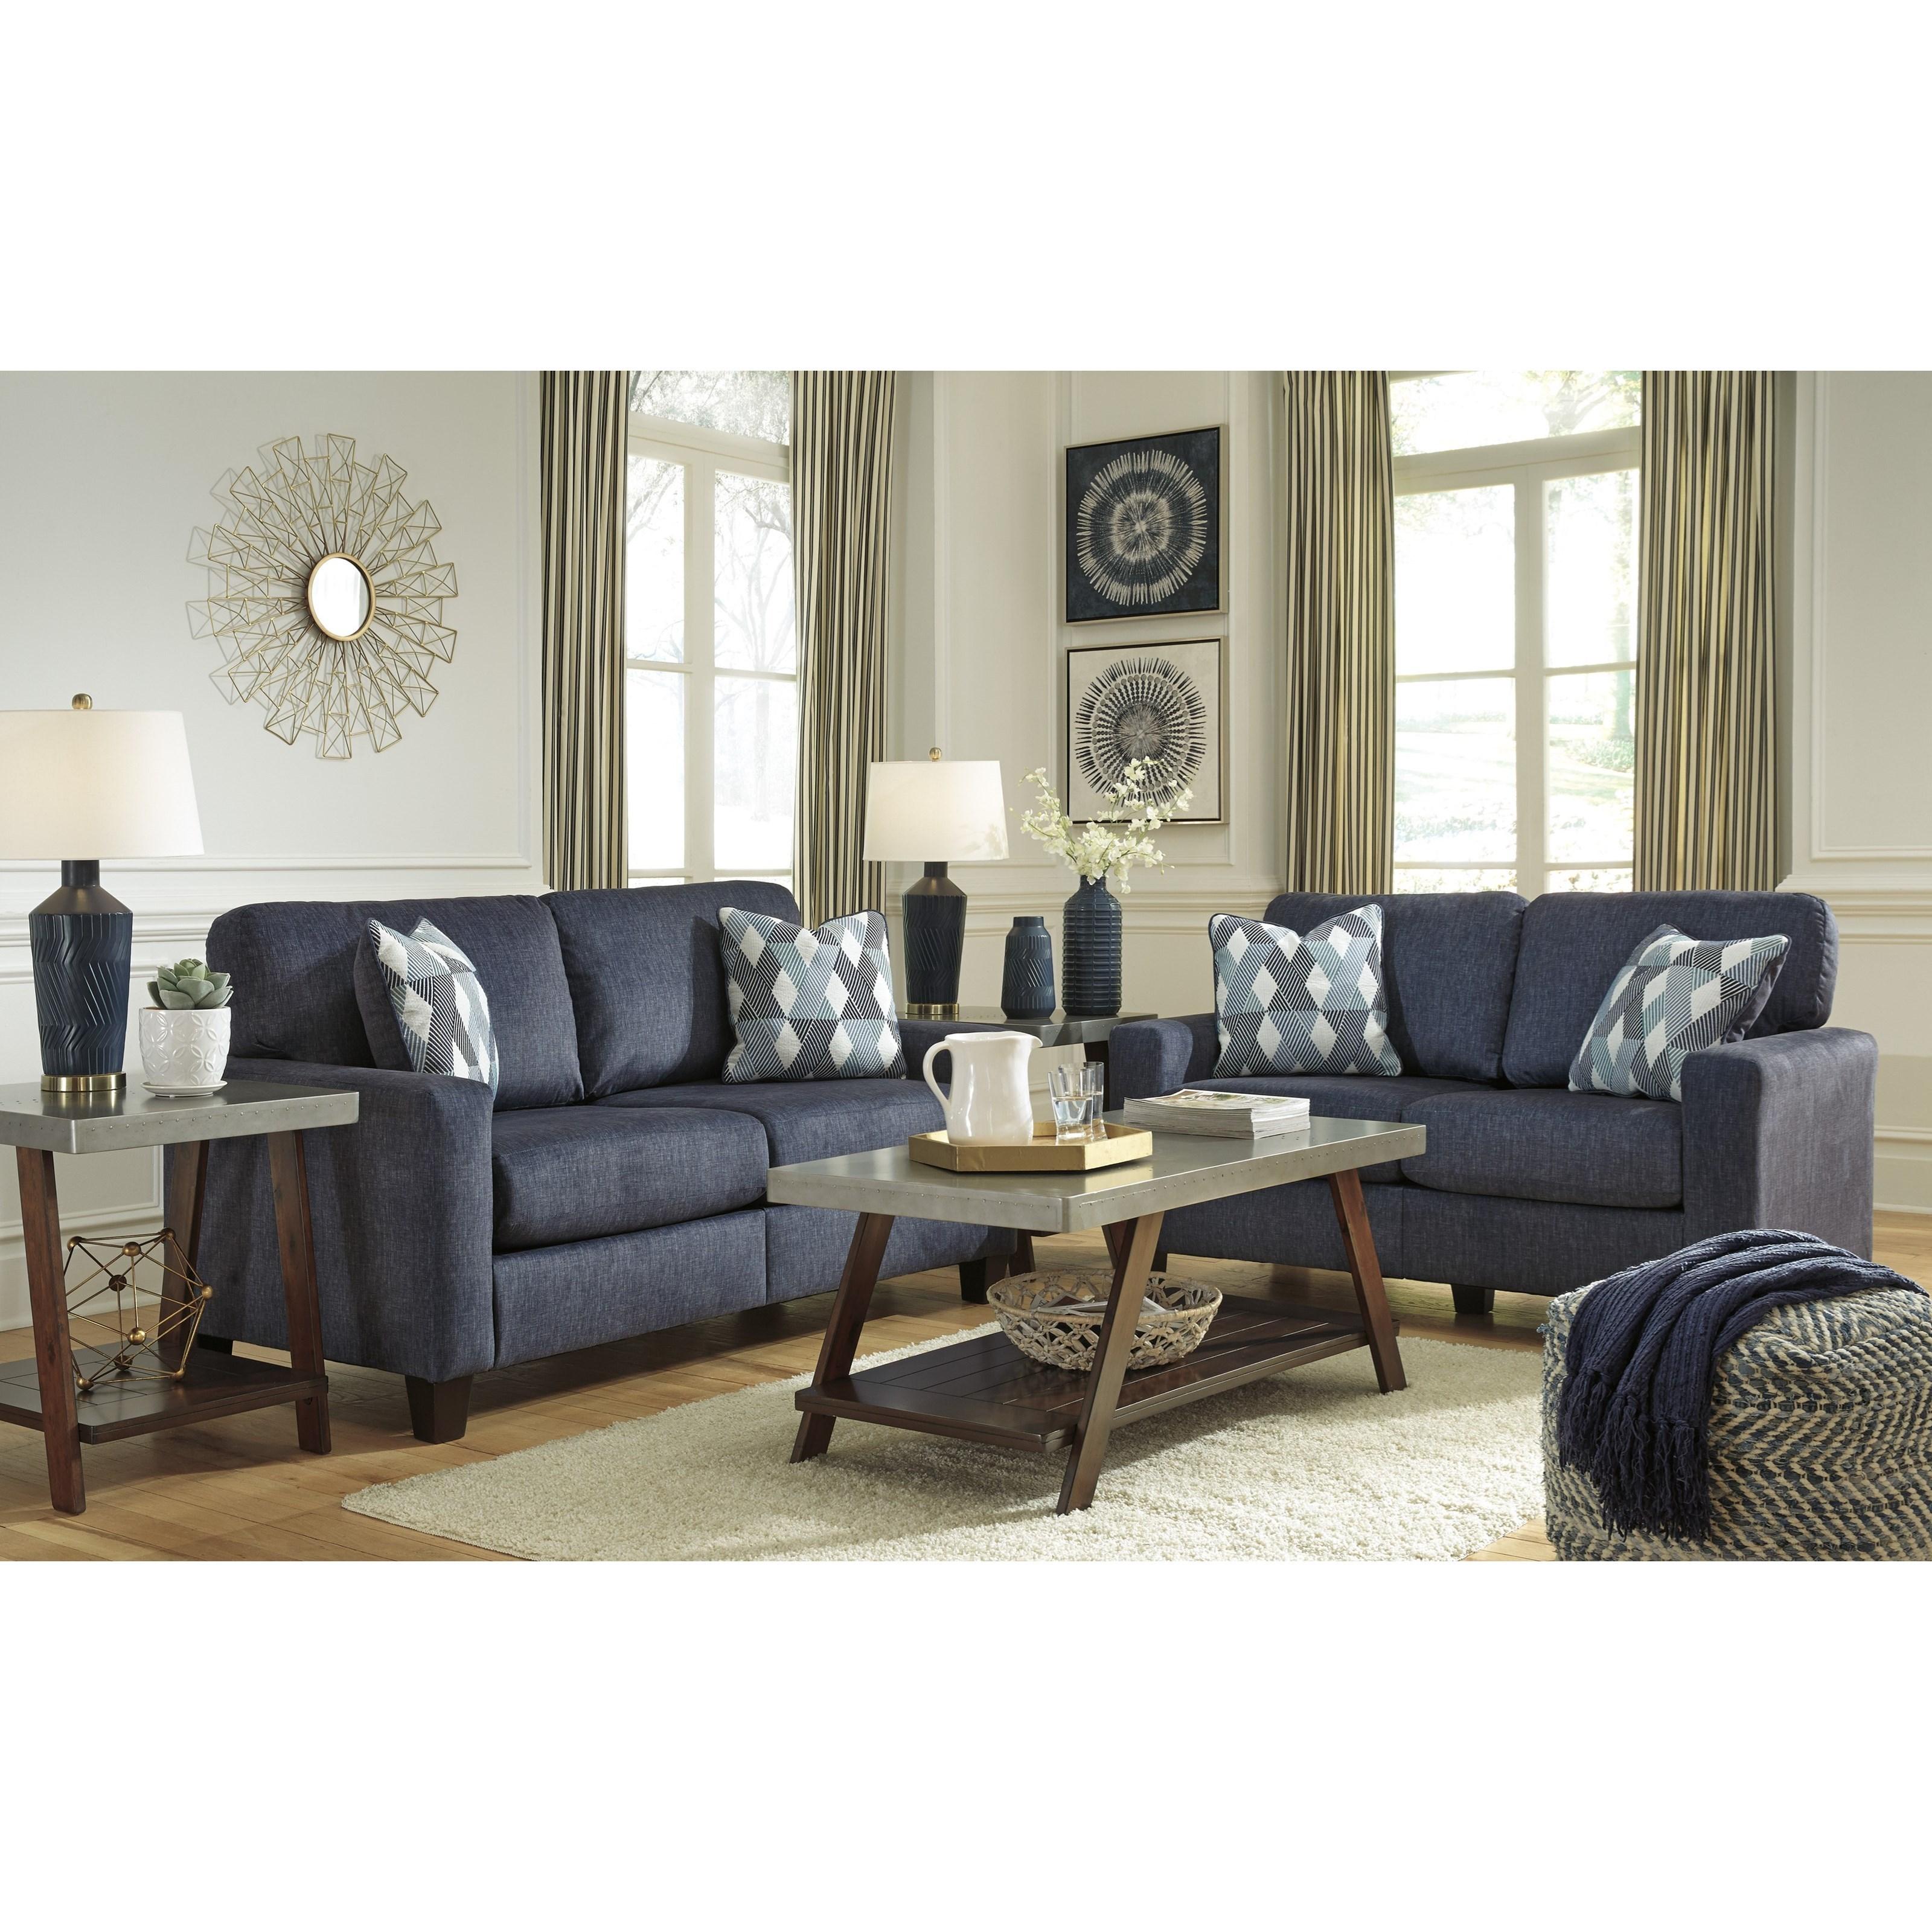 Ashley Signature Design Burgos Living Room Group Johnny Janosik Stationary Living Room Groups